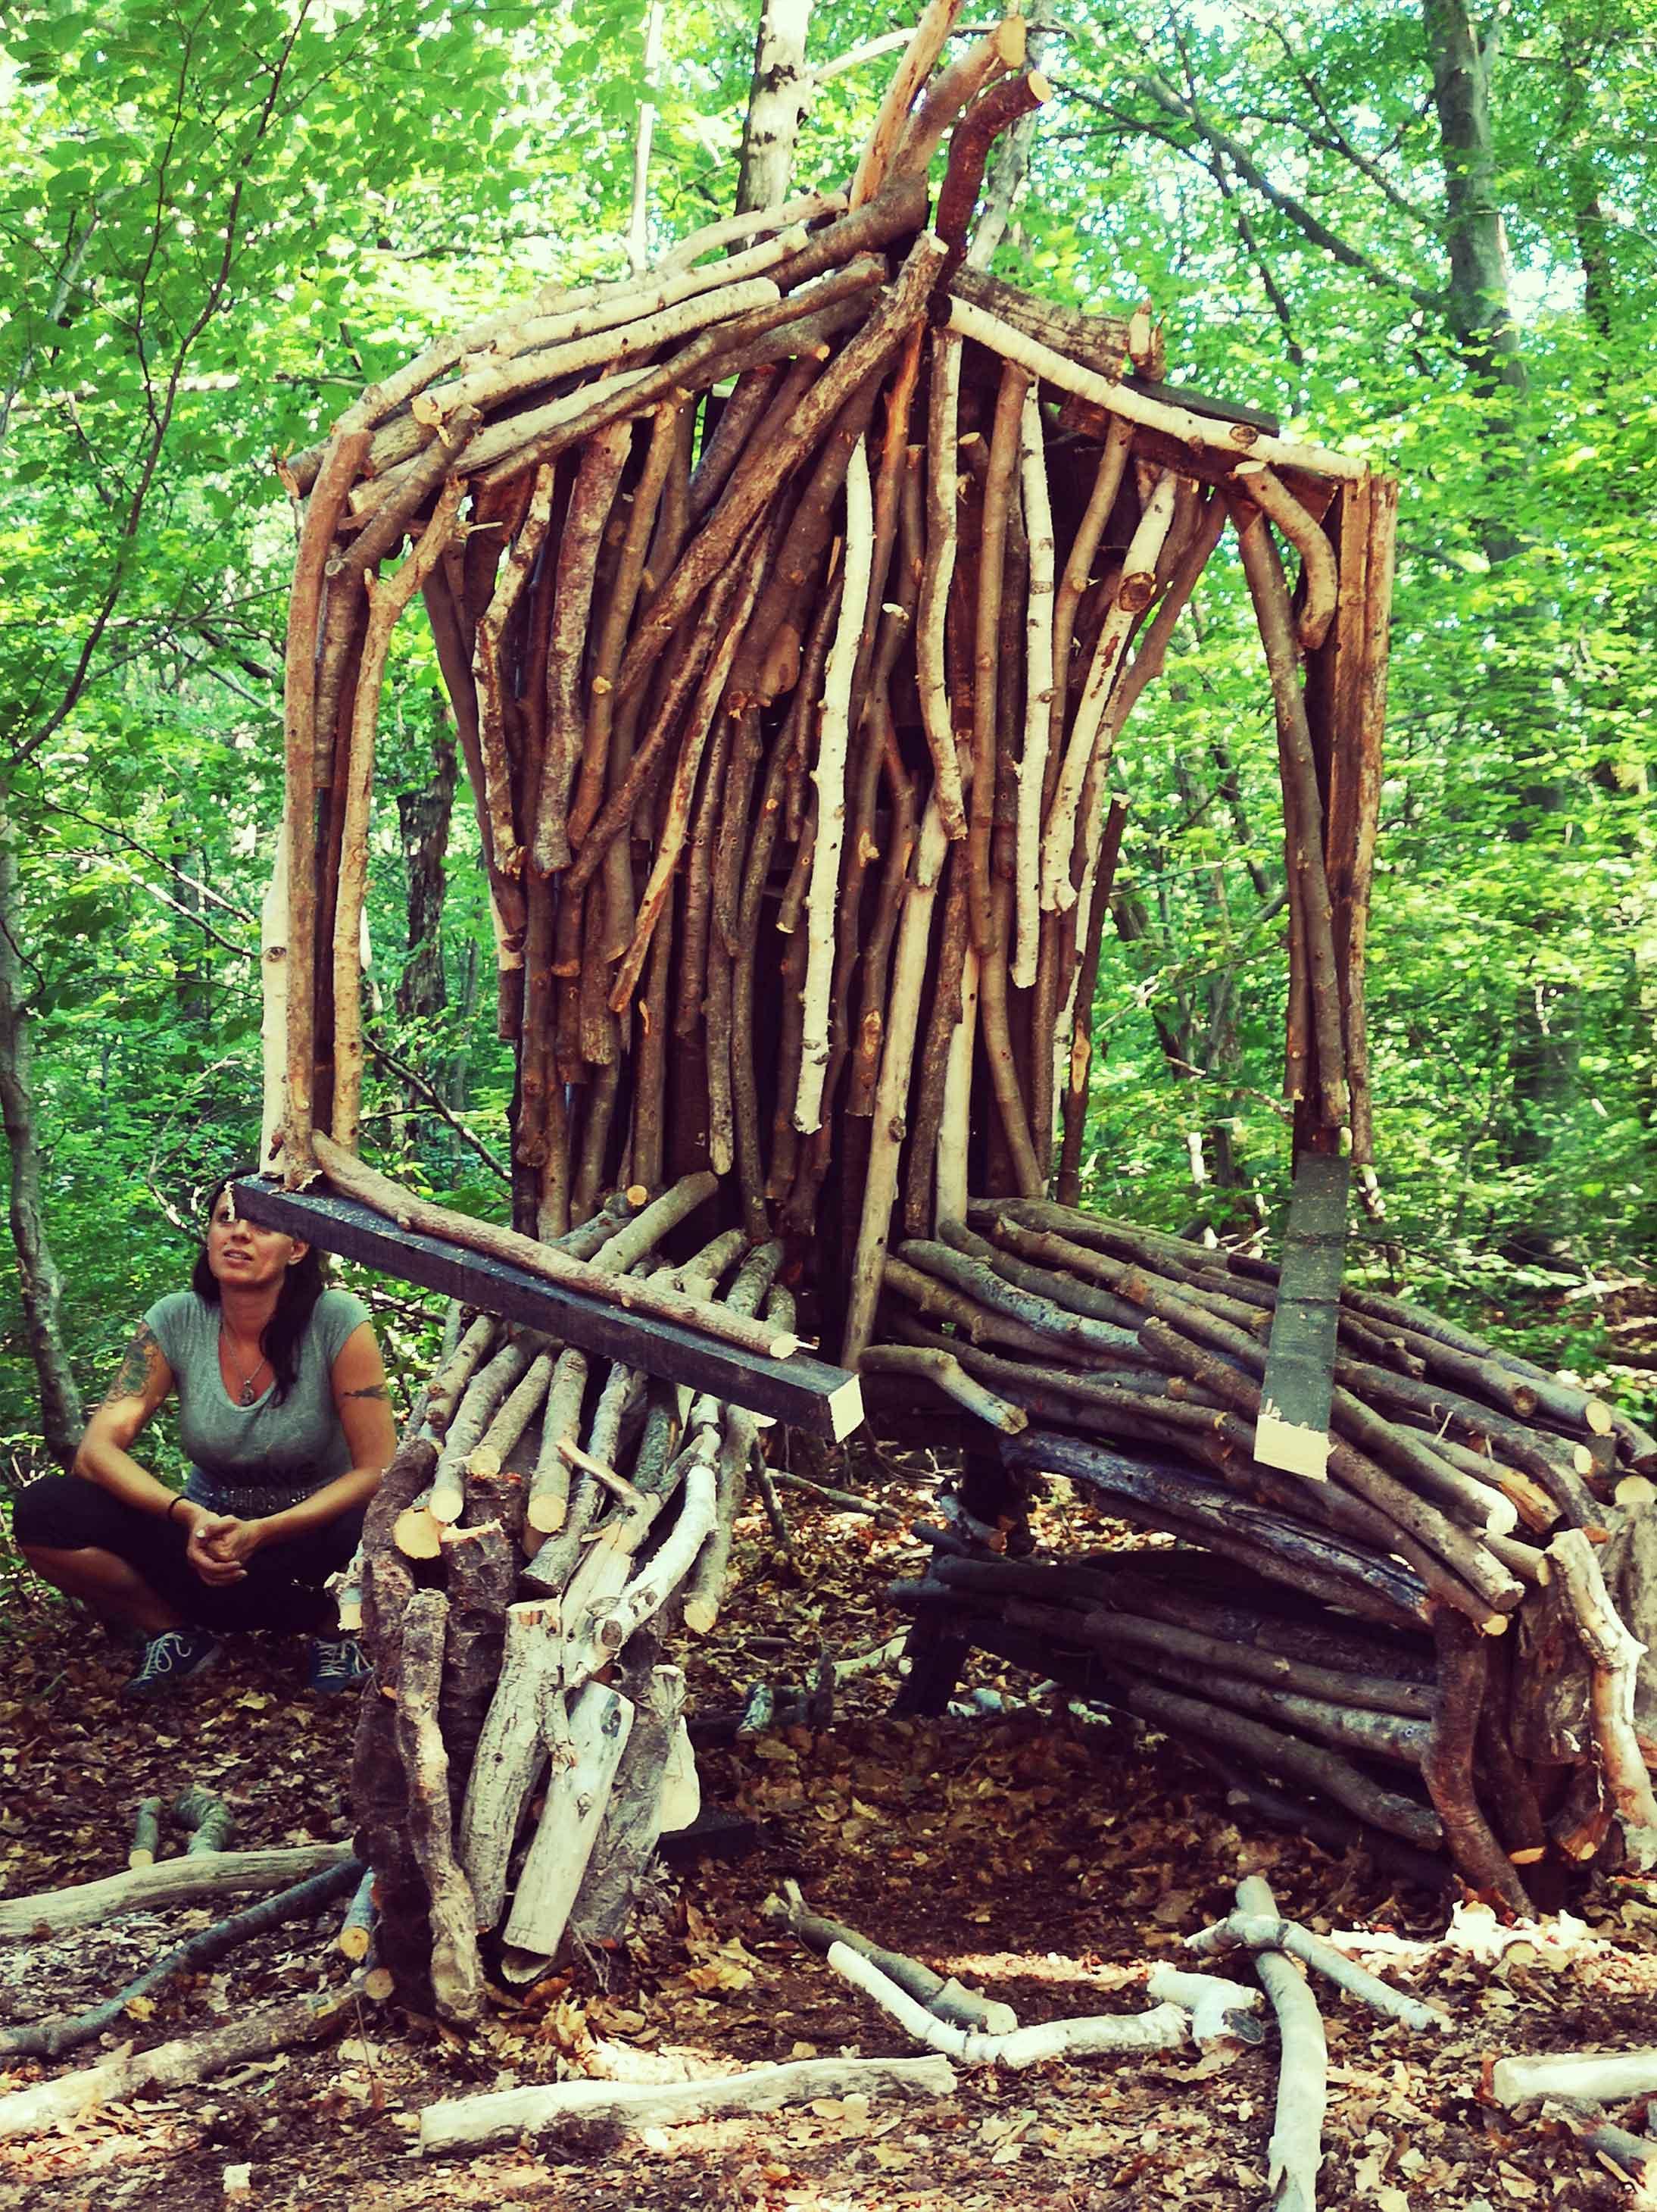 Alessandra Aita rinascita | artinbosco